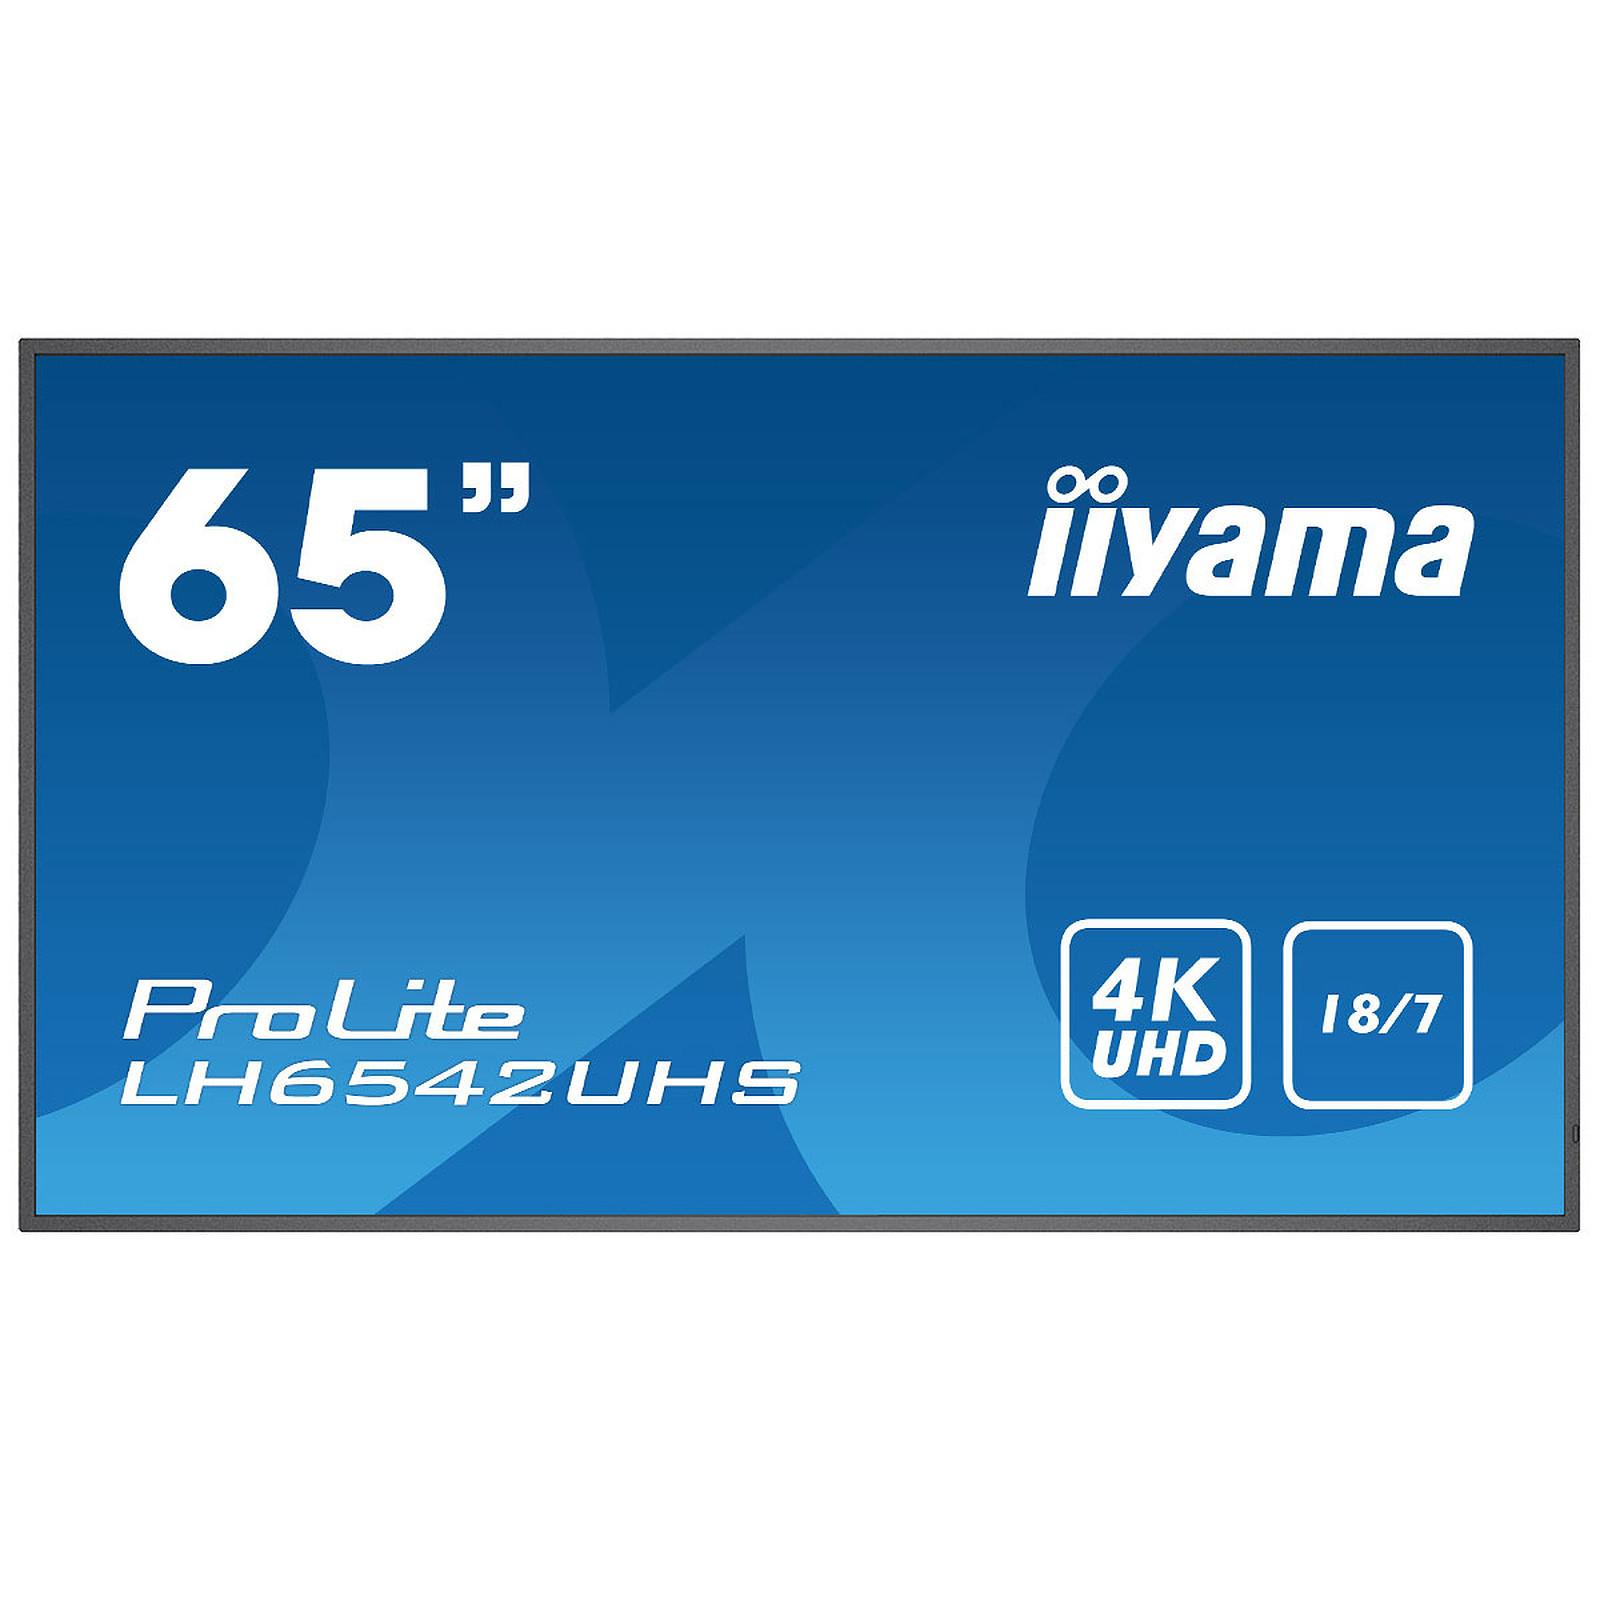 "iiyama 64.5"" LED - ProLite LH6542UHS-B1"